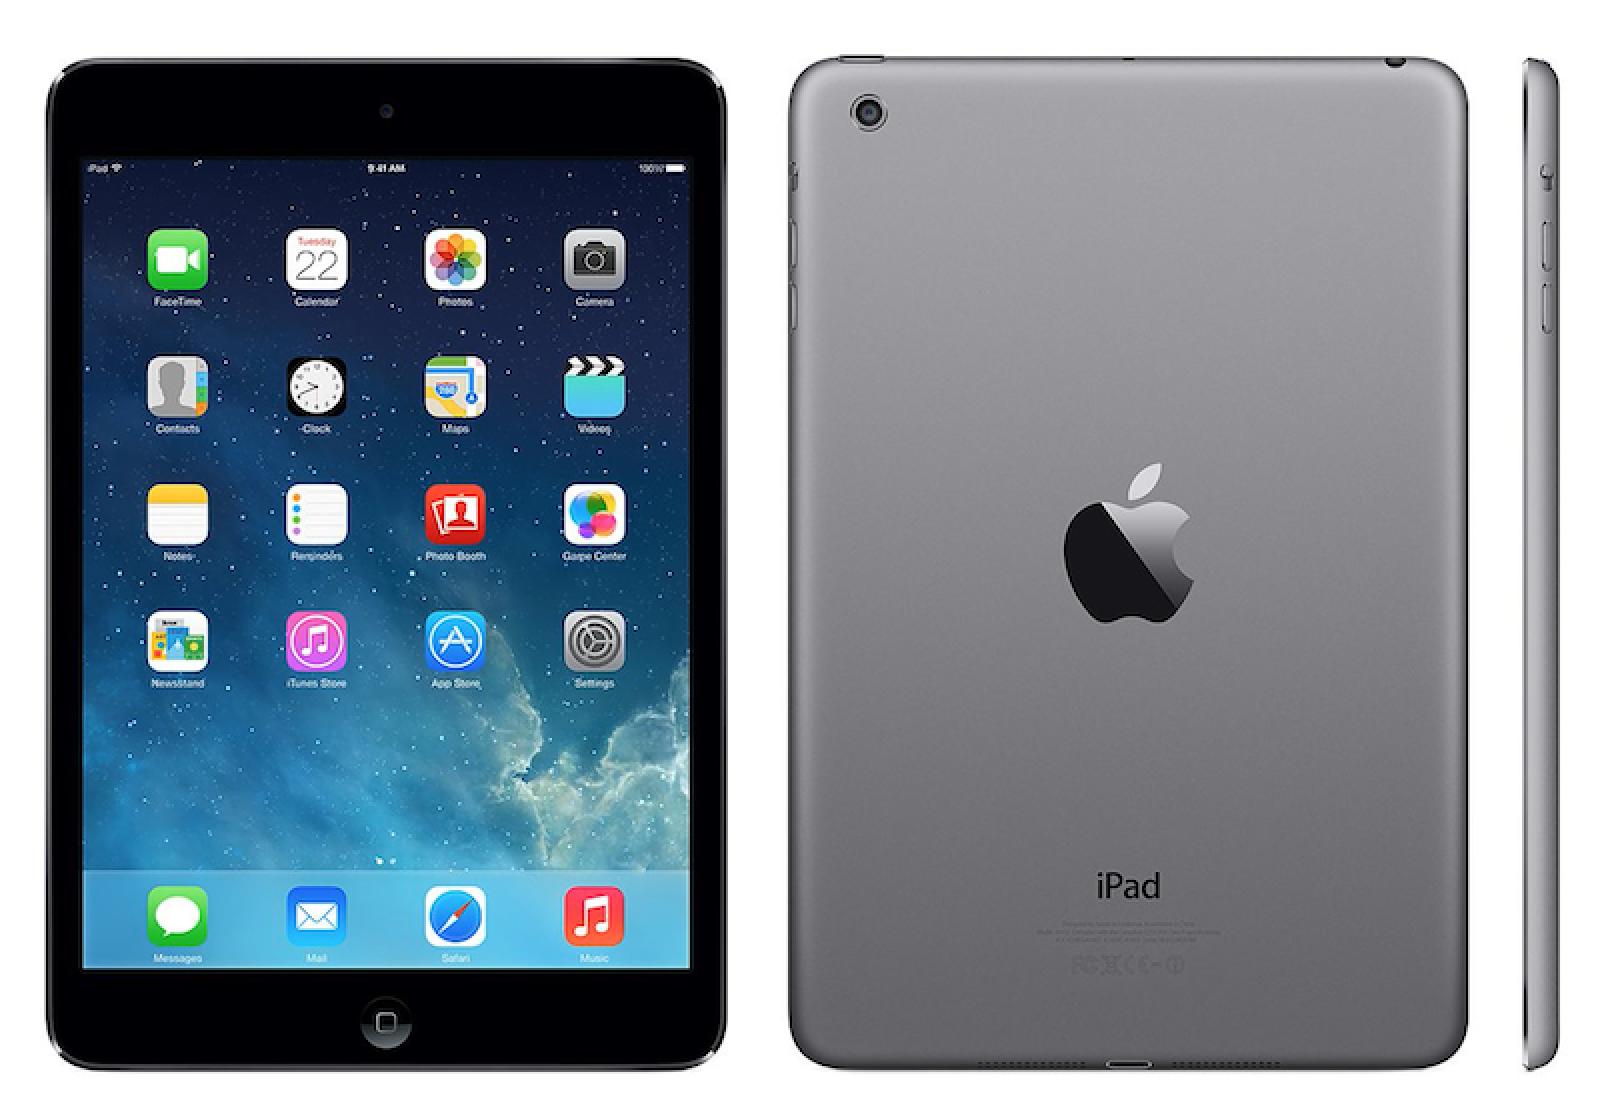 Ipad Retina: Apple 'Unclear' On Whether Retina IPad Mini Supplies Will